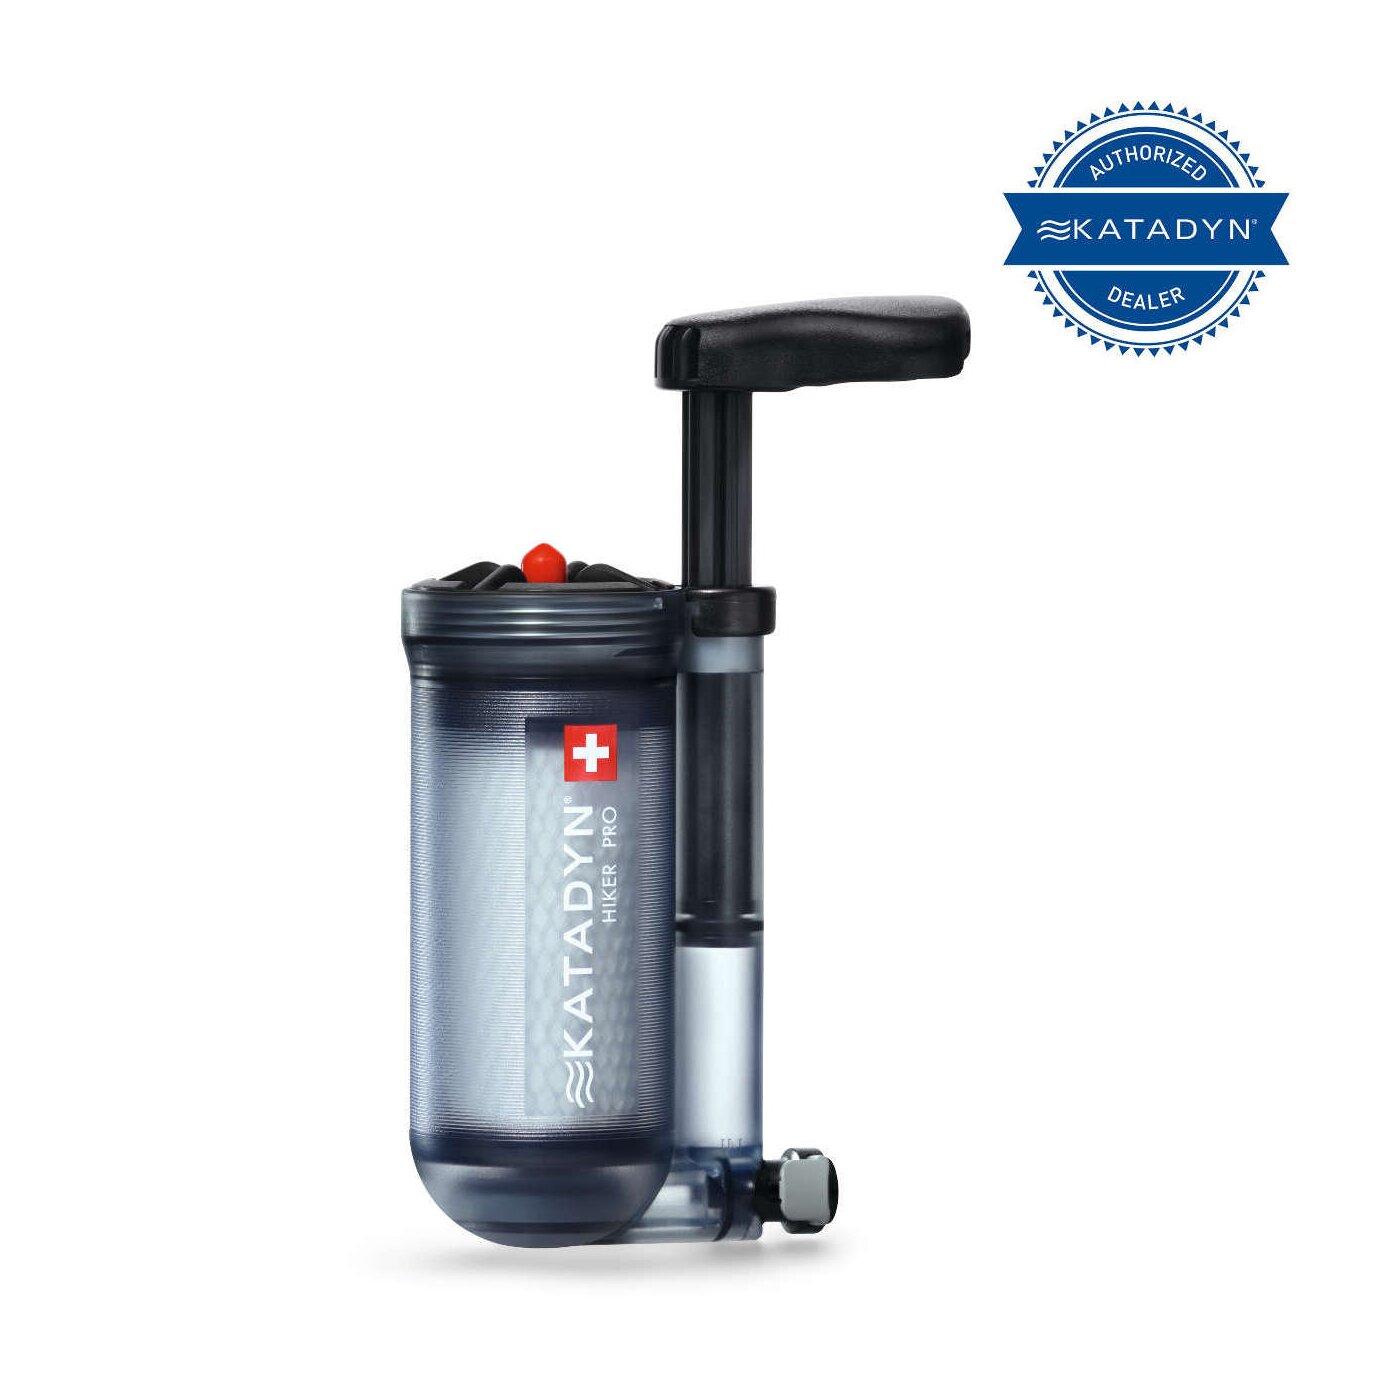 filtro de agua set 1 Katadyn Hiker pro wartungsset